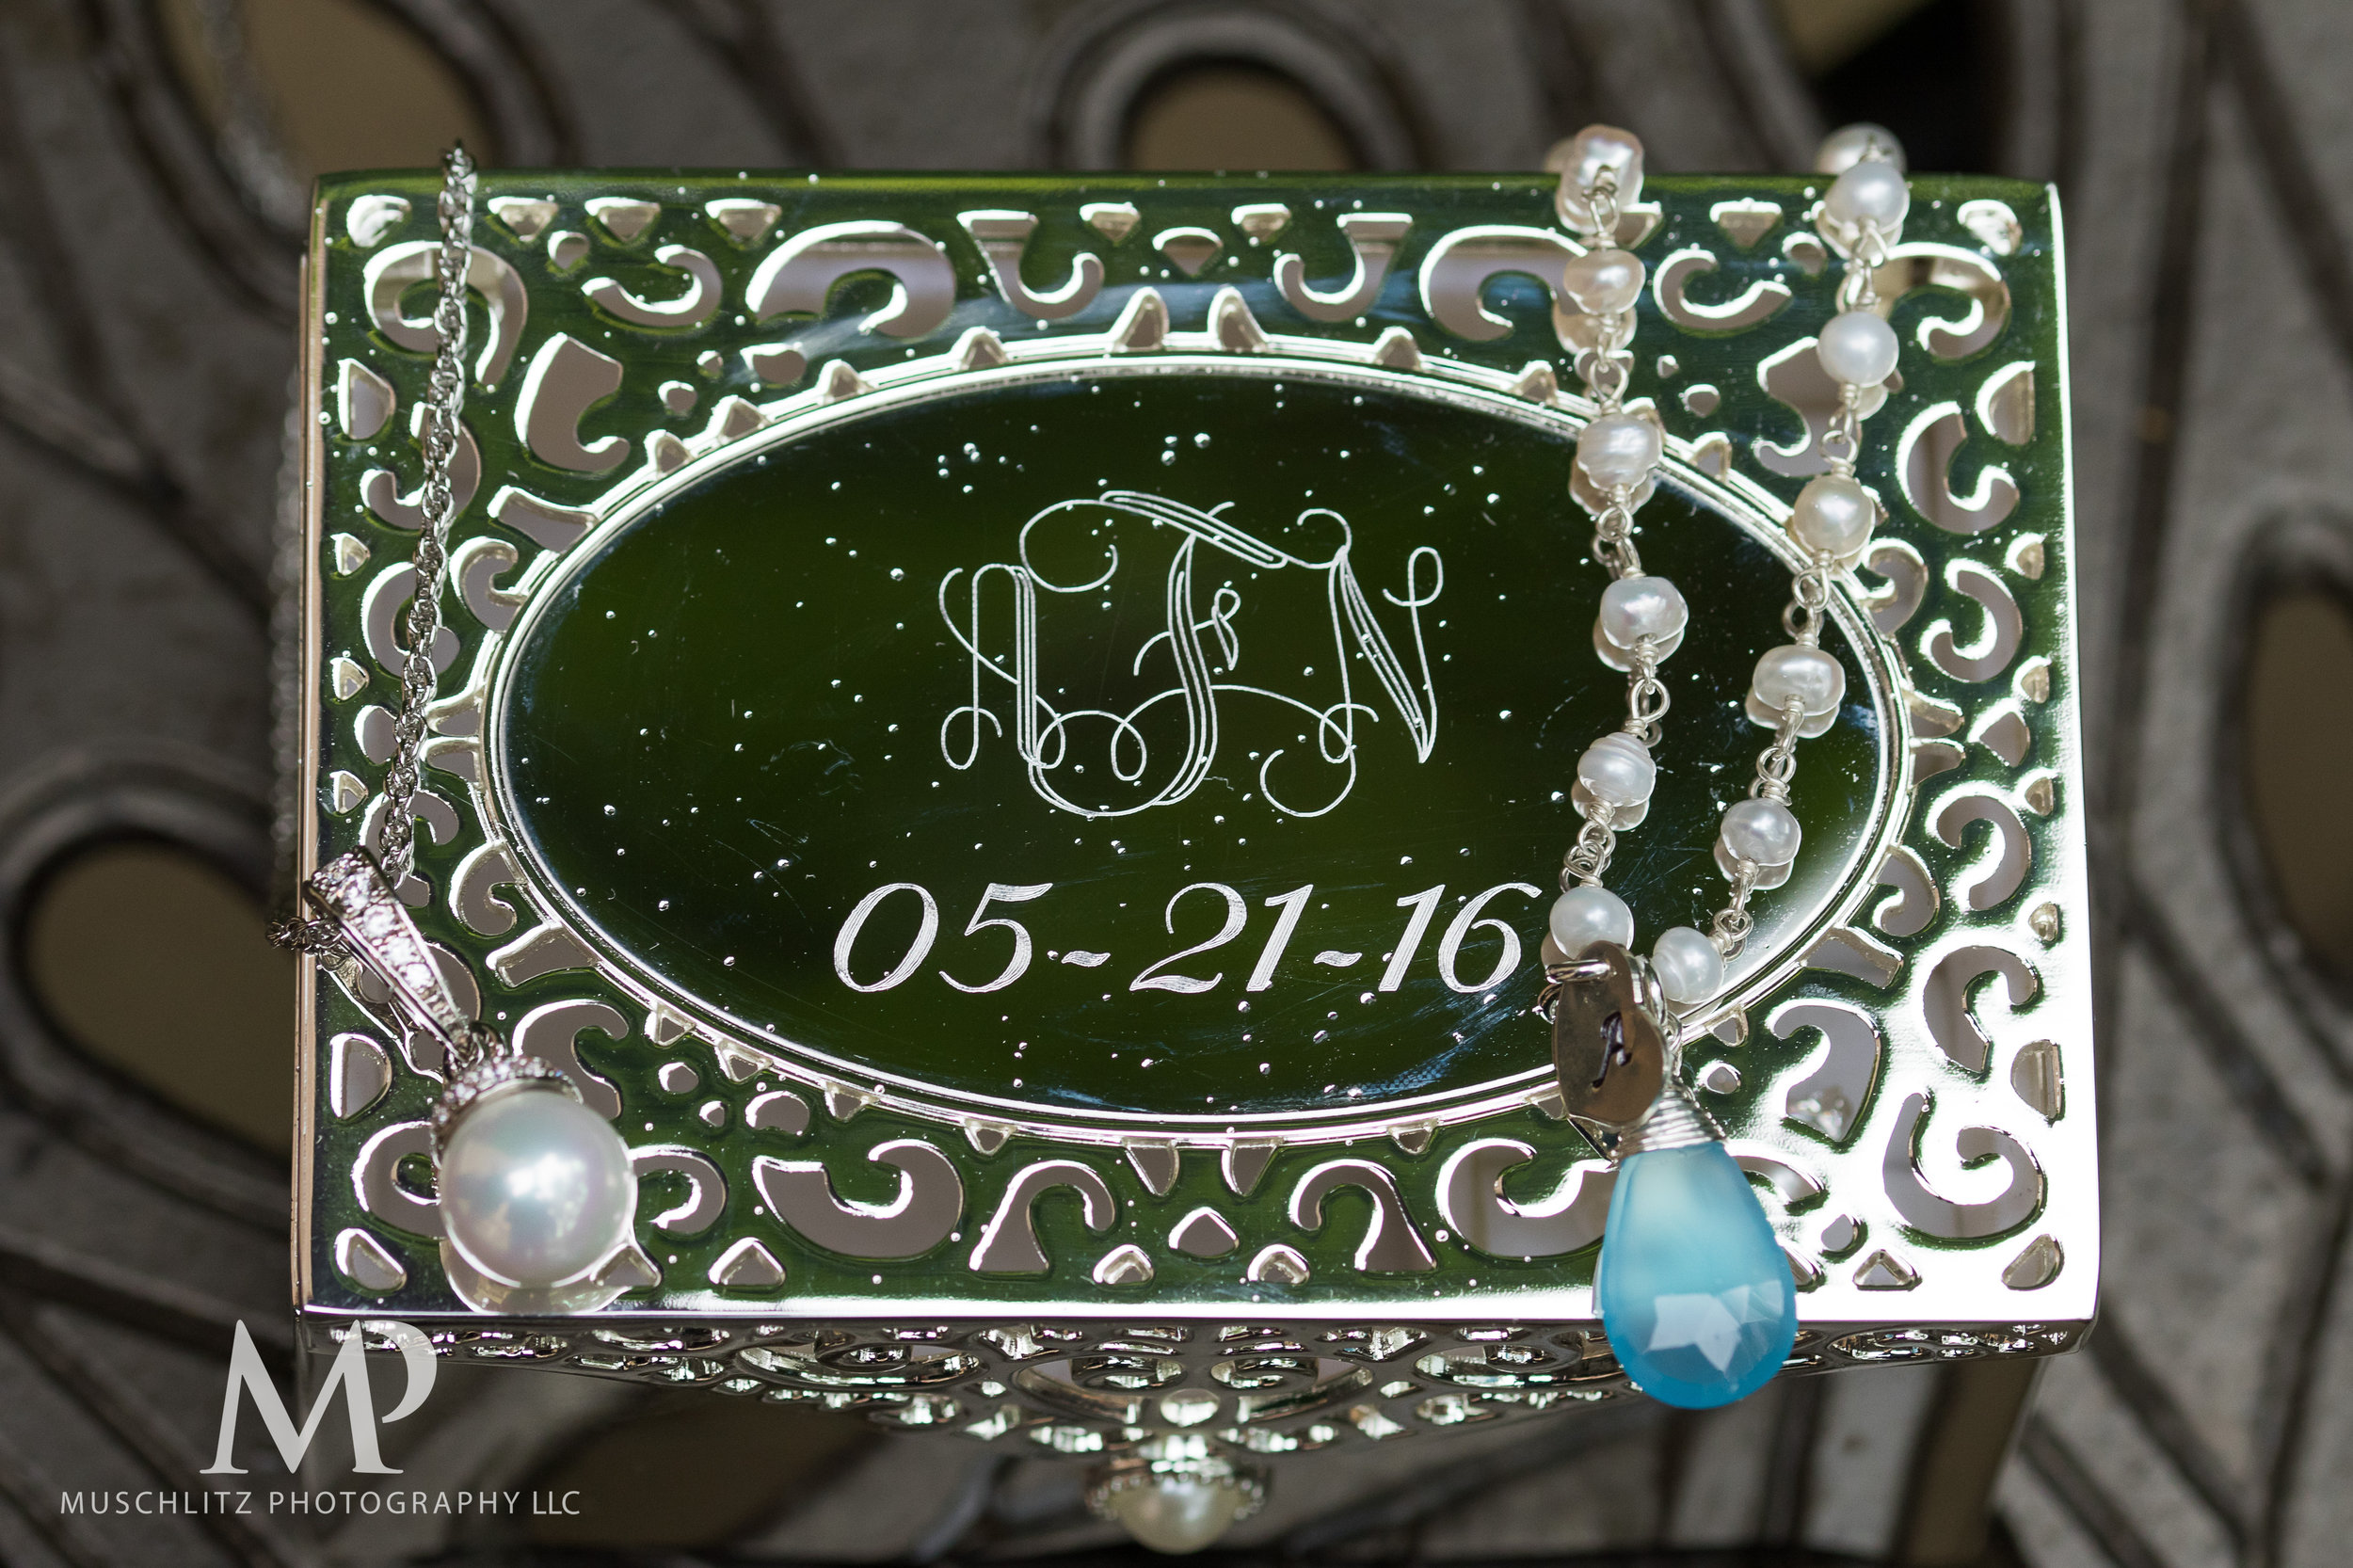 club-at-corazon-wedding-ceremony-reception-columbus-dublin-ohio-ohio-university-theme-009.JPG